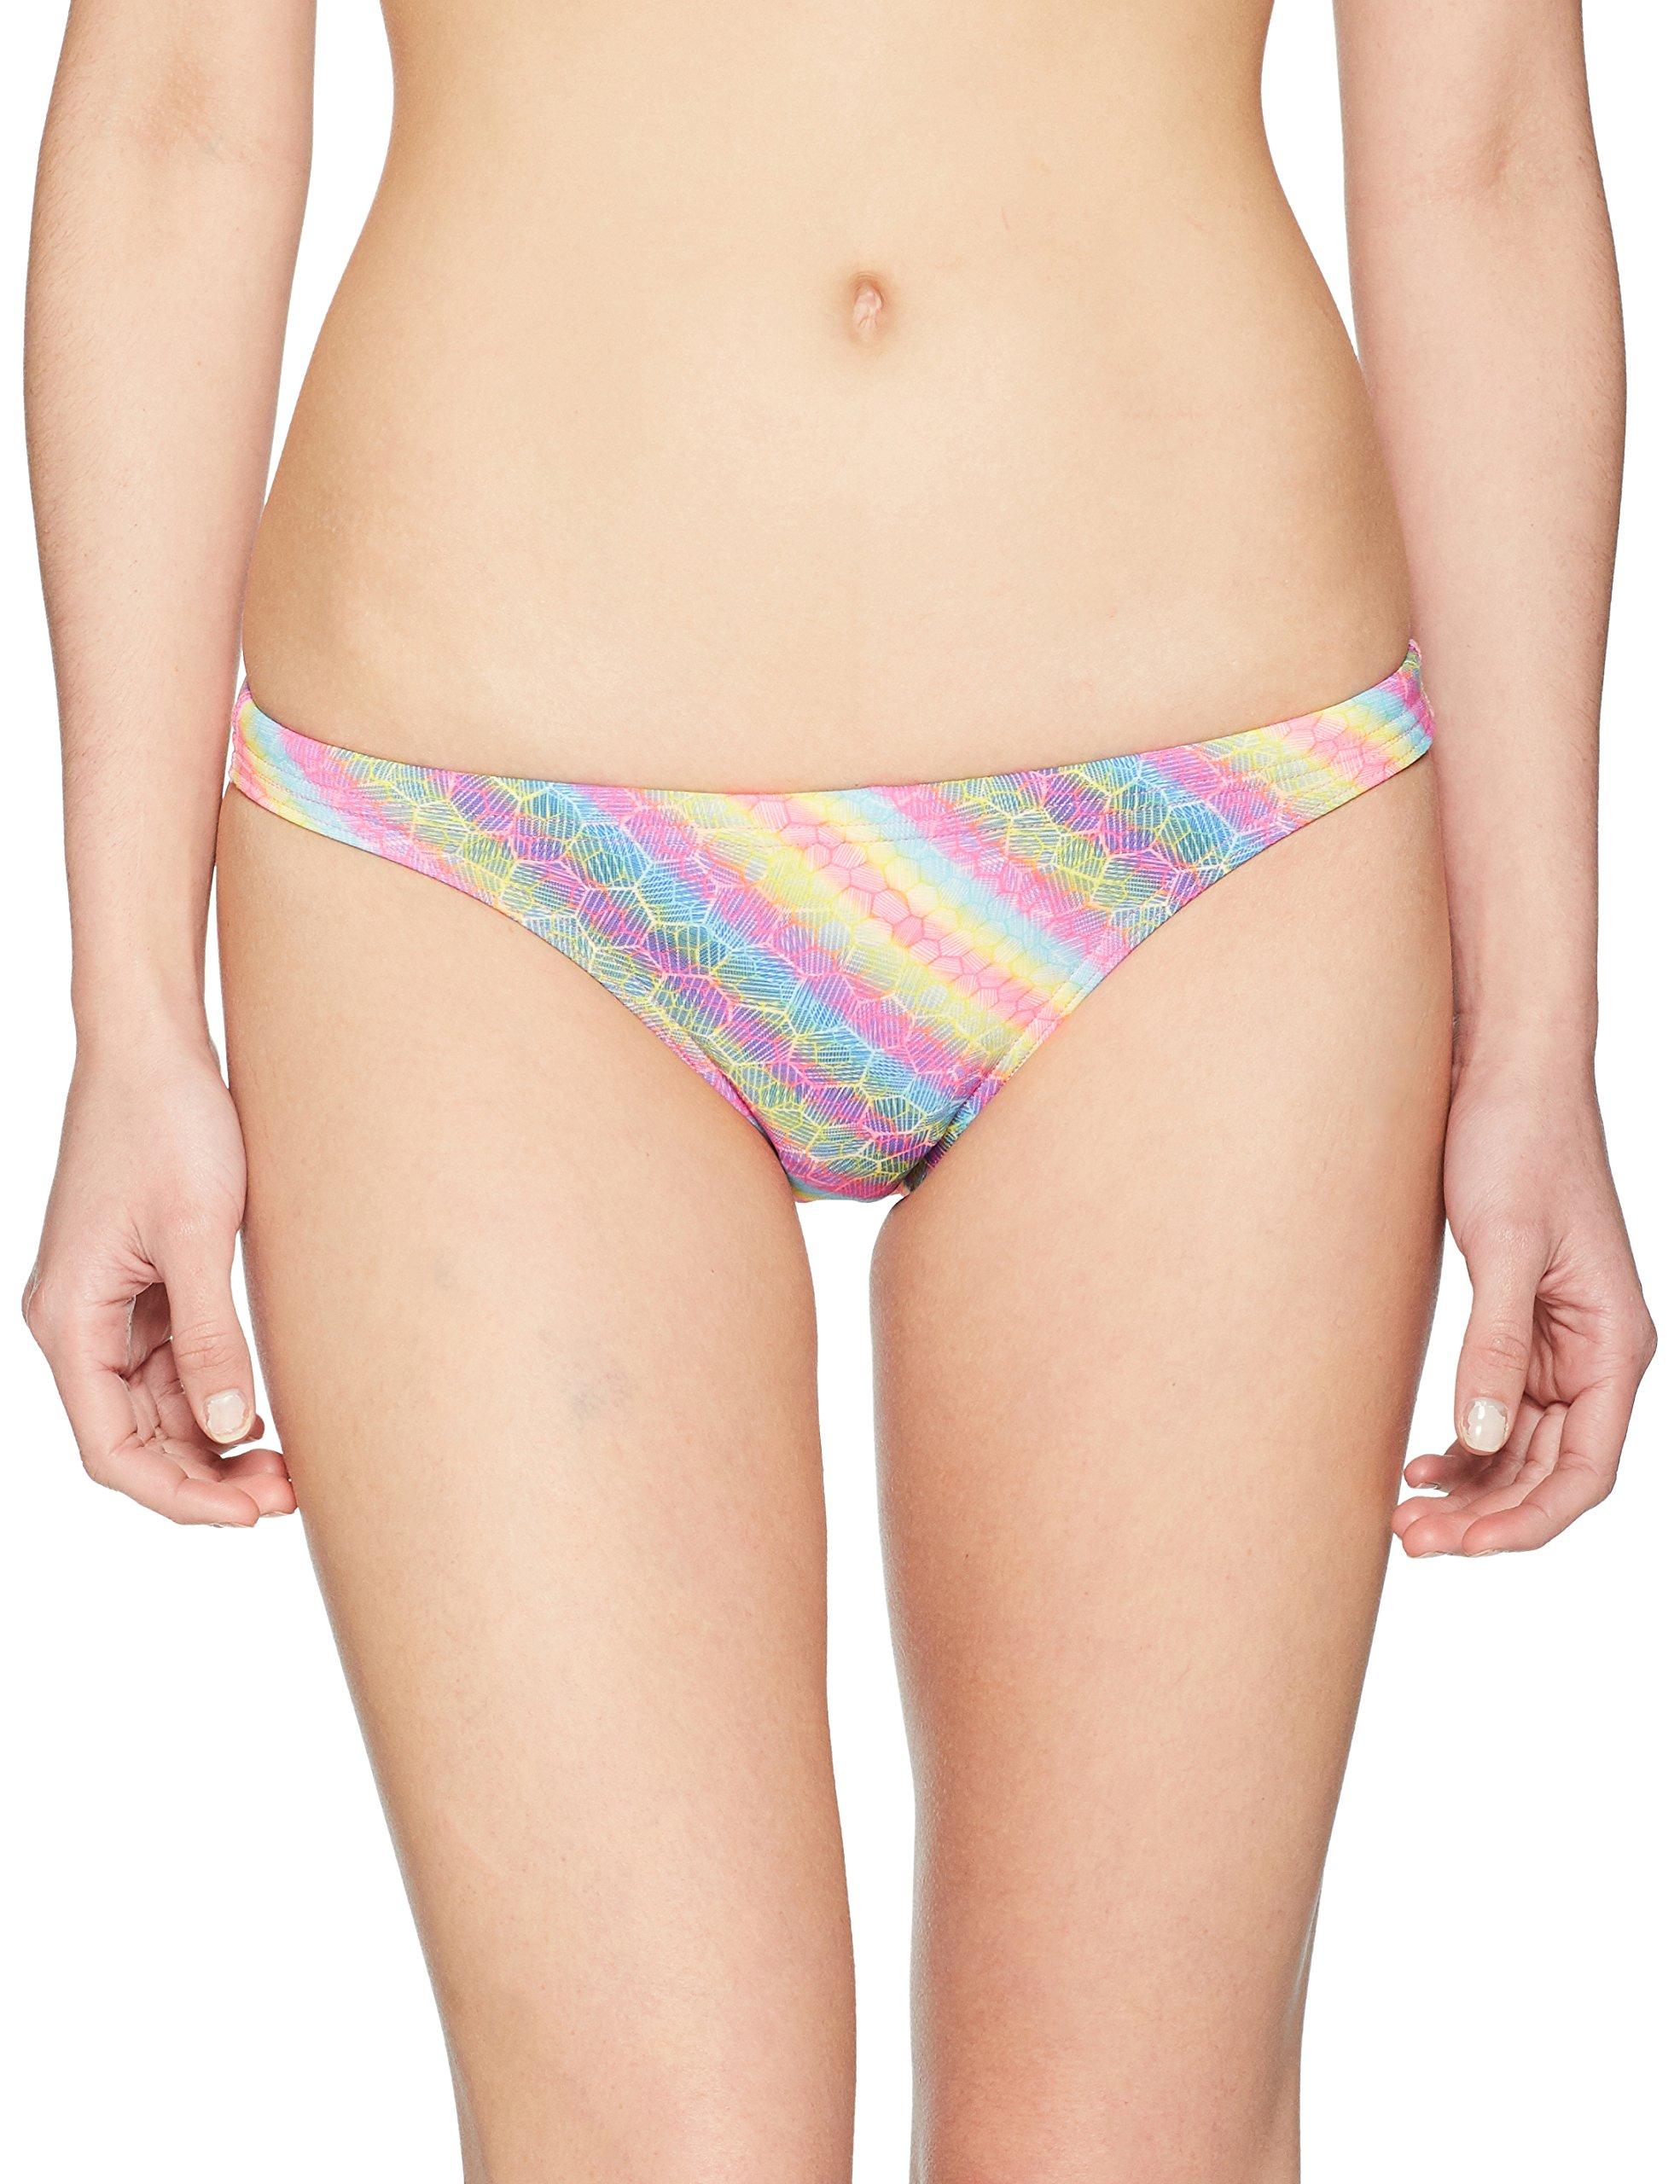 Arena Women's Rulebreaker Free Bikini Bottom Swimsuit, Paparazzi Multi, X-Large by Arena